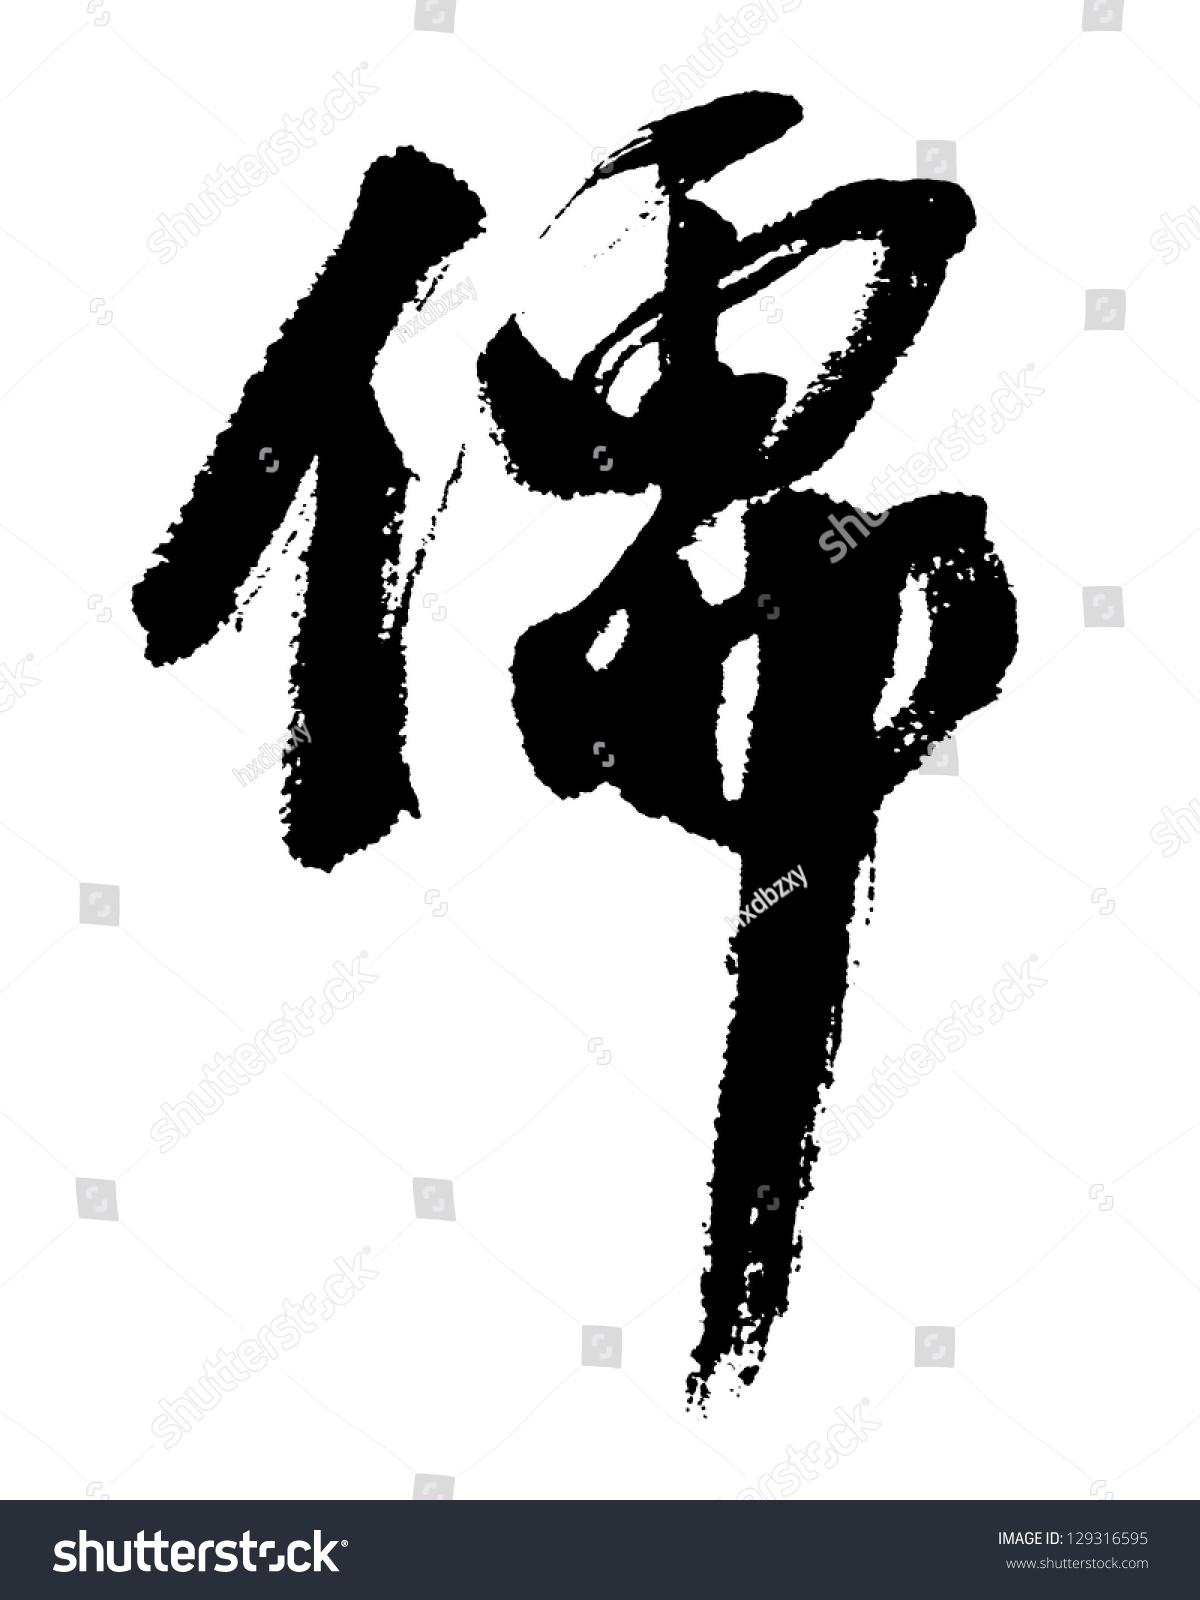 Illustration black chinese calligraphy word confucianism stock illustration of black chinese calligraphy word for confucianism biocorpaavc Images